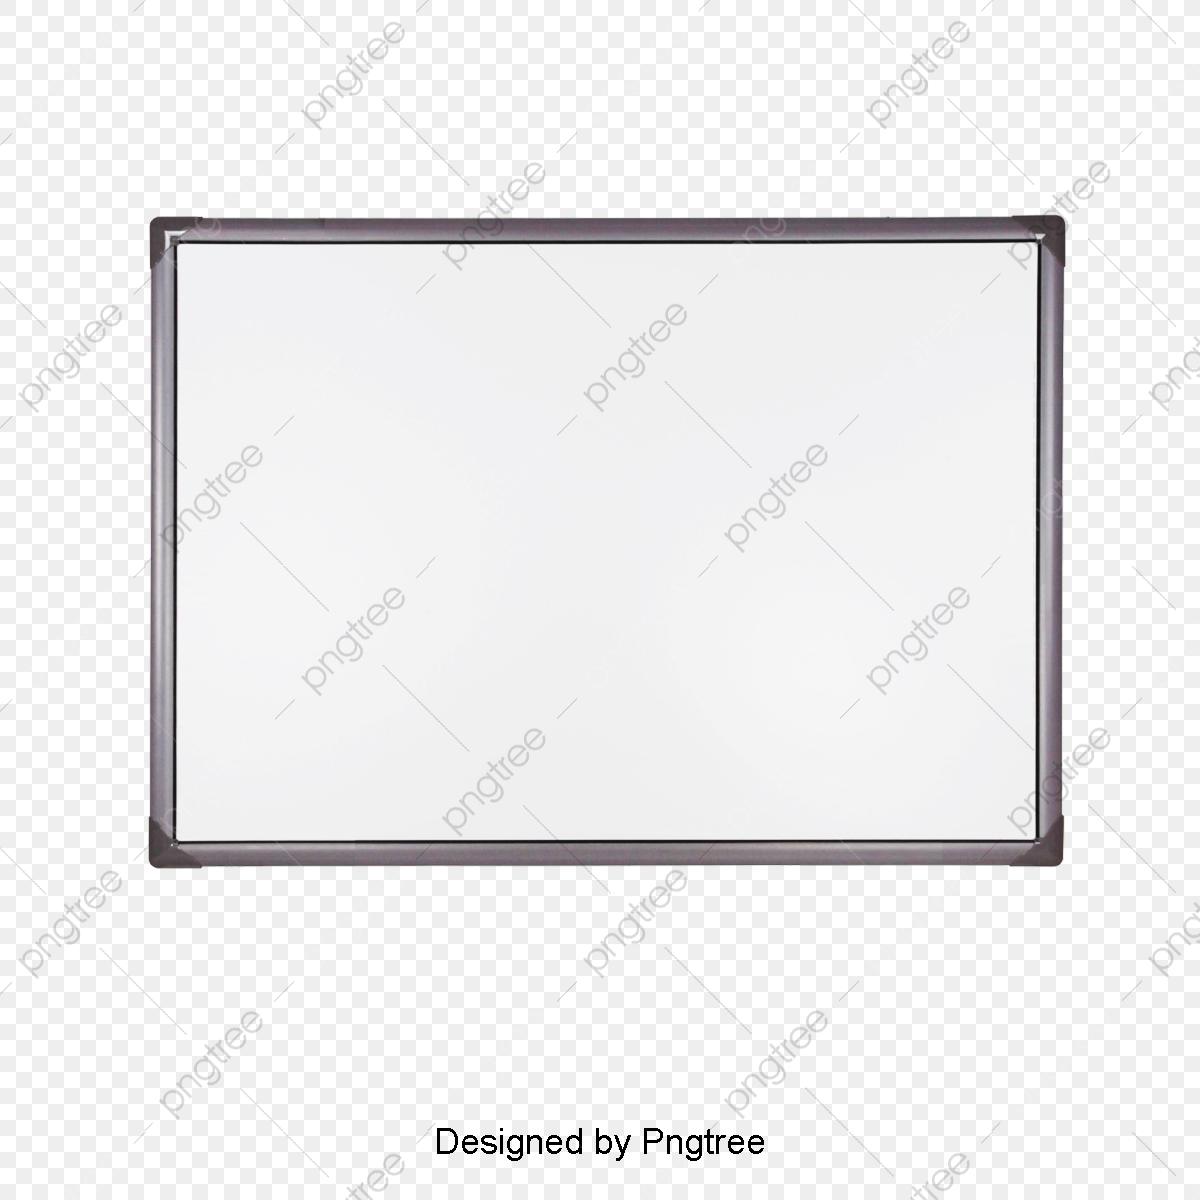 Vector Whiteboard, Whiteboard, Blackboard, Cartoon Whiteboard PNG.